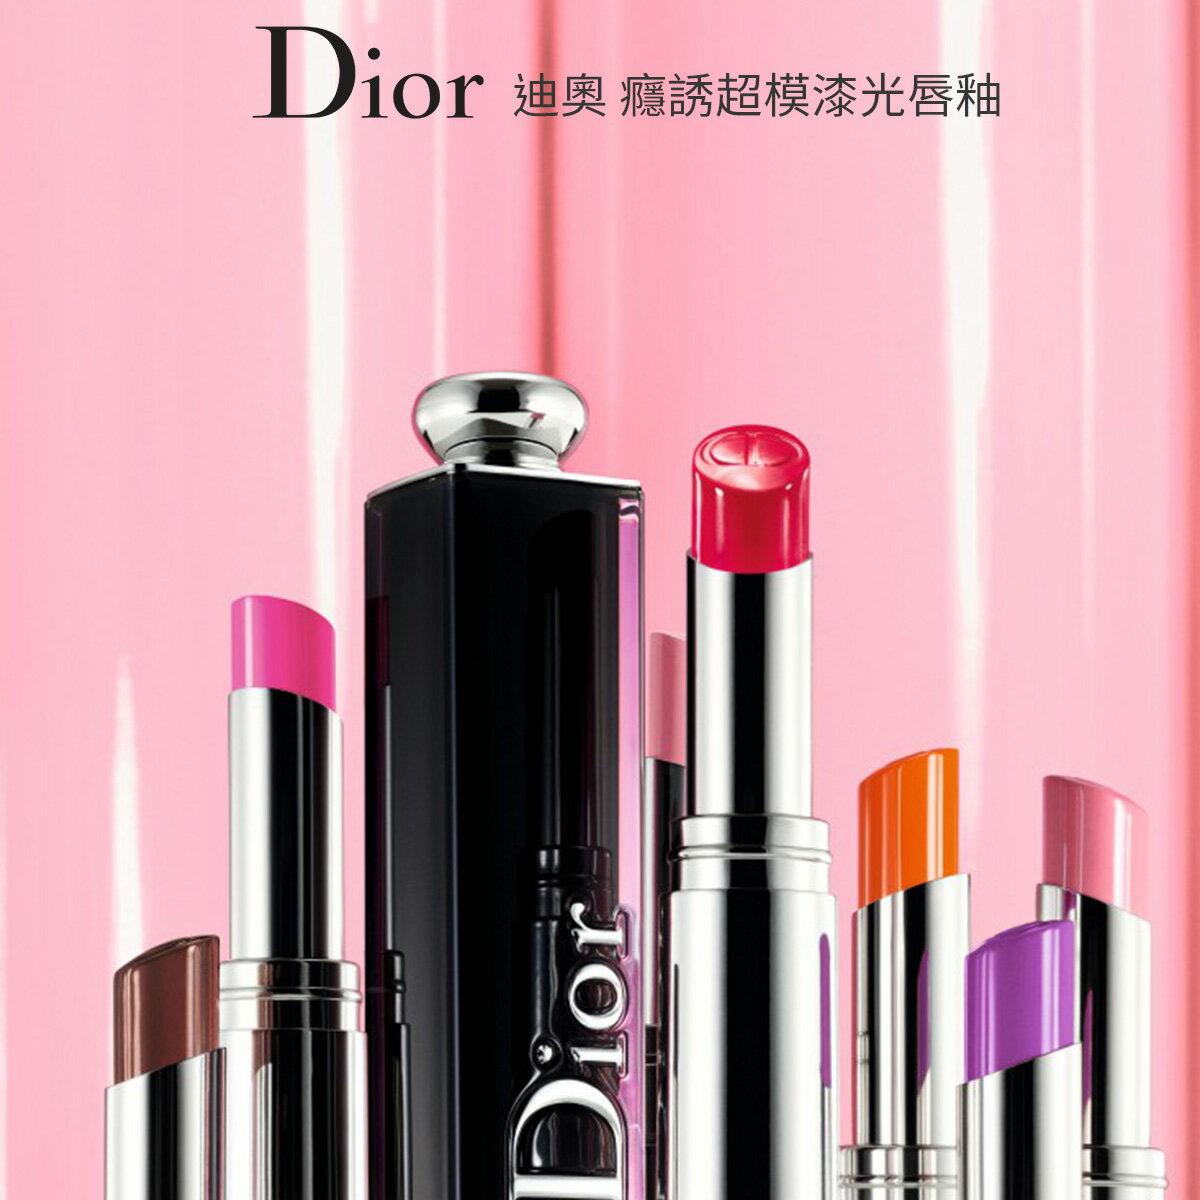 Dior 迪奧癮誘超模漆光唇釉 #740 熱銷款 專櫃公司貨【SP嚴選家】 1